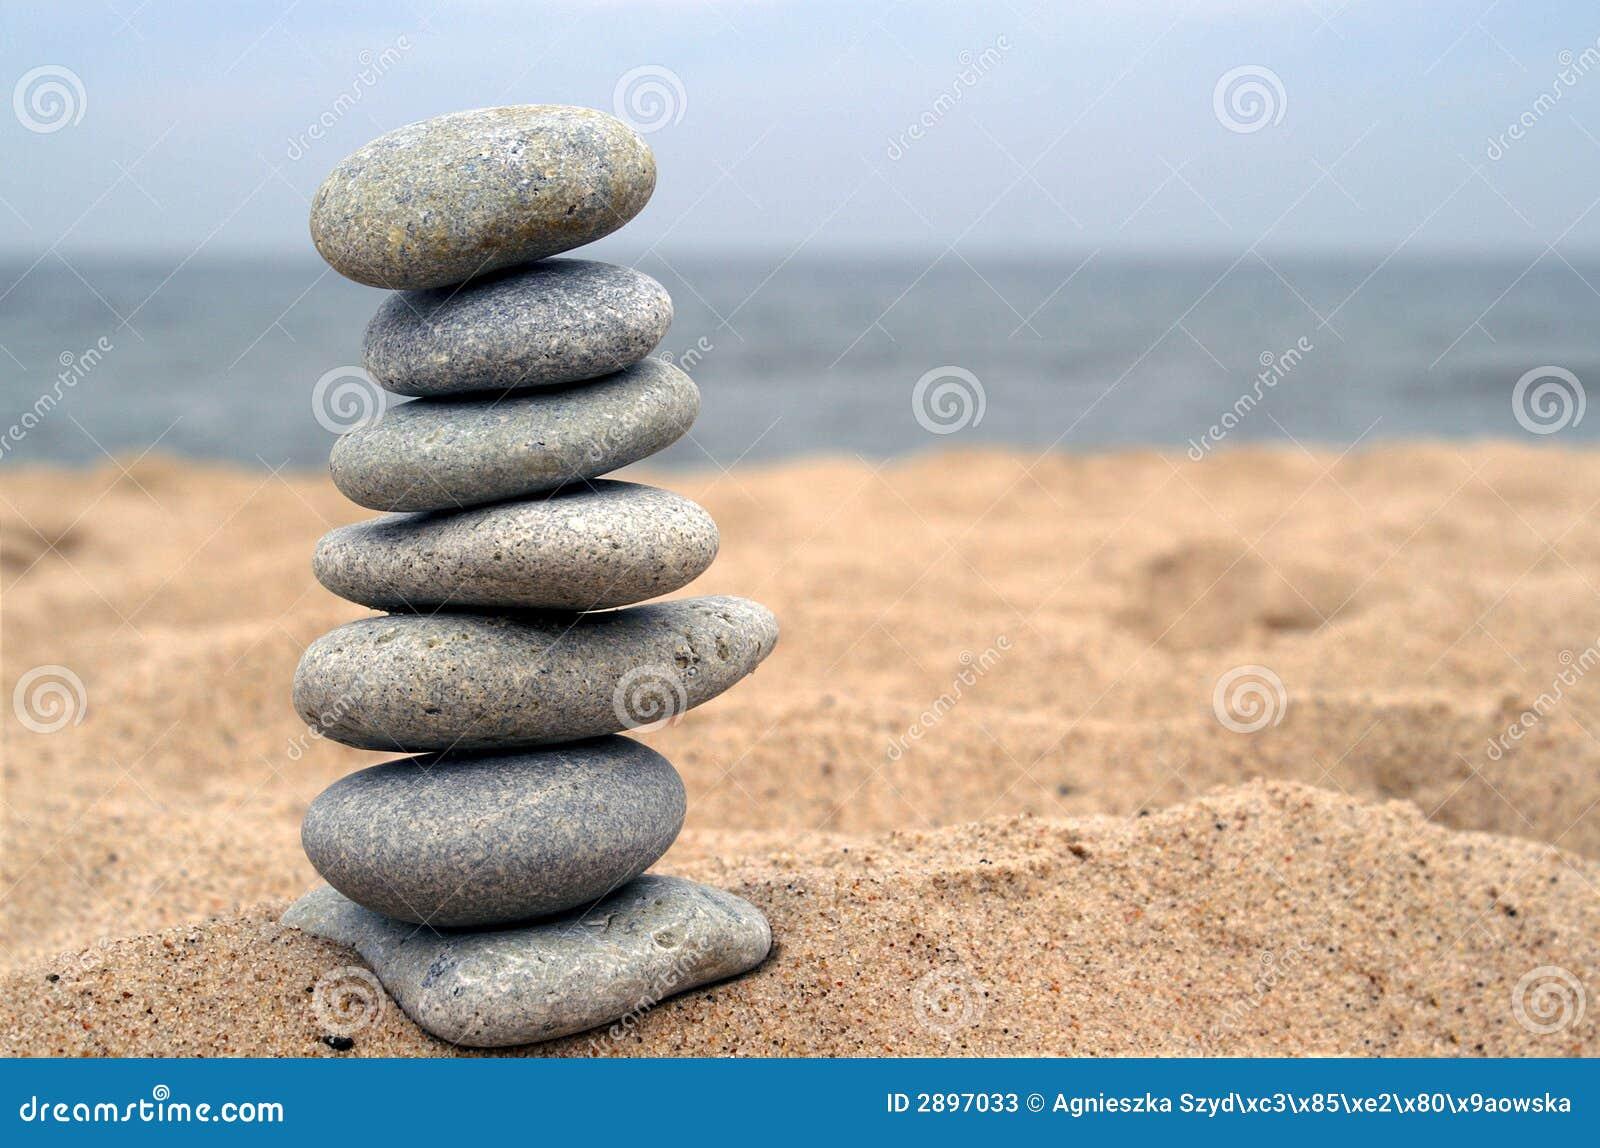 balanced stones on beach stock image image of stack harmony 2897033. Black Bedroom Furniture Sets. Home Design Ideas